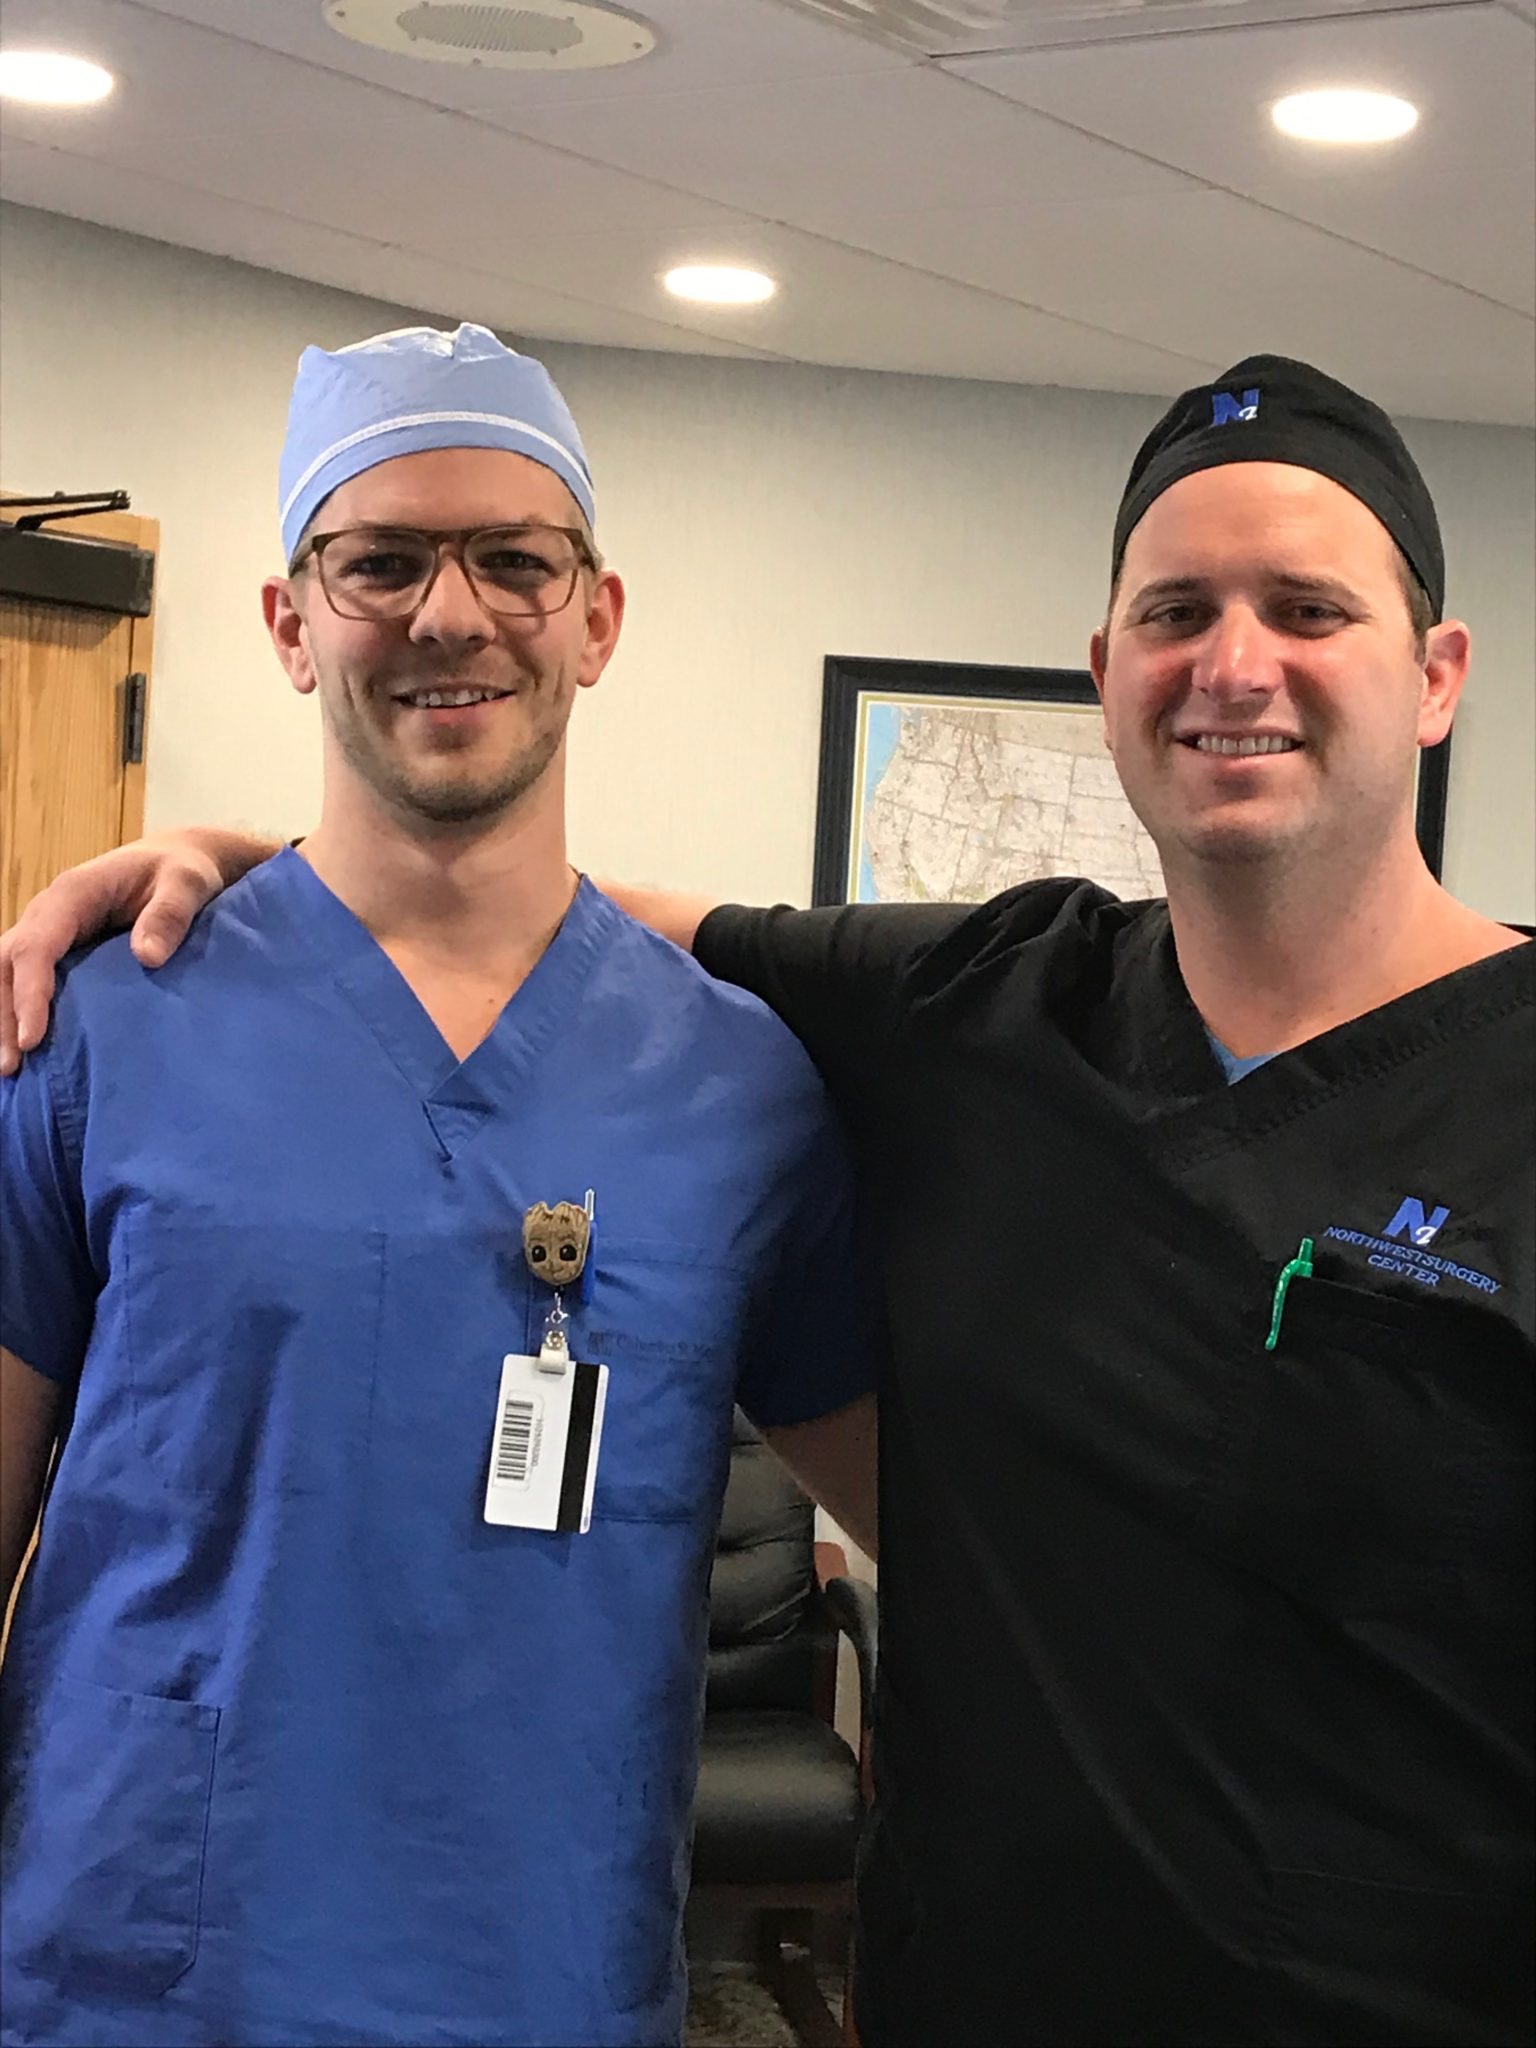 Dr. Jordan Sullivan and Dr. Brant McCartan